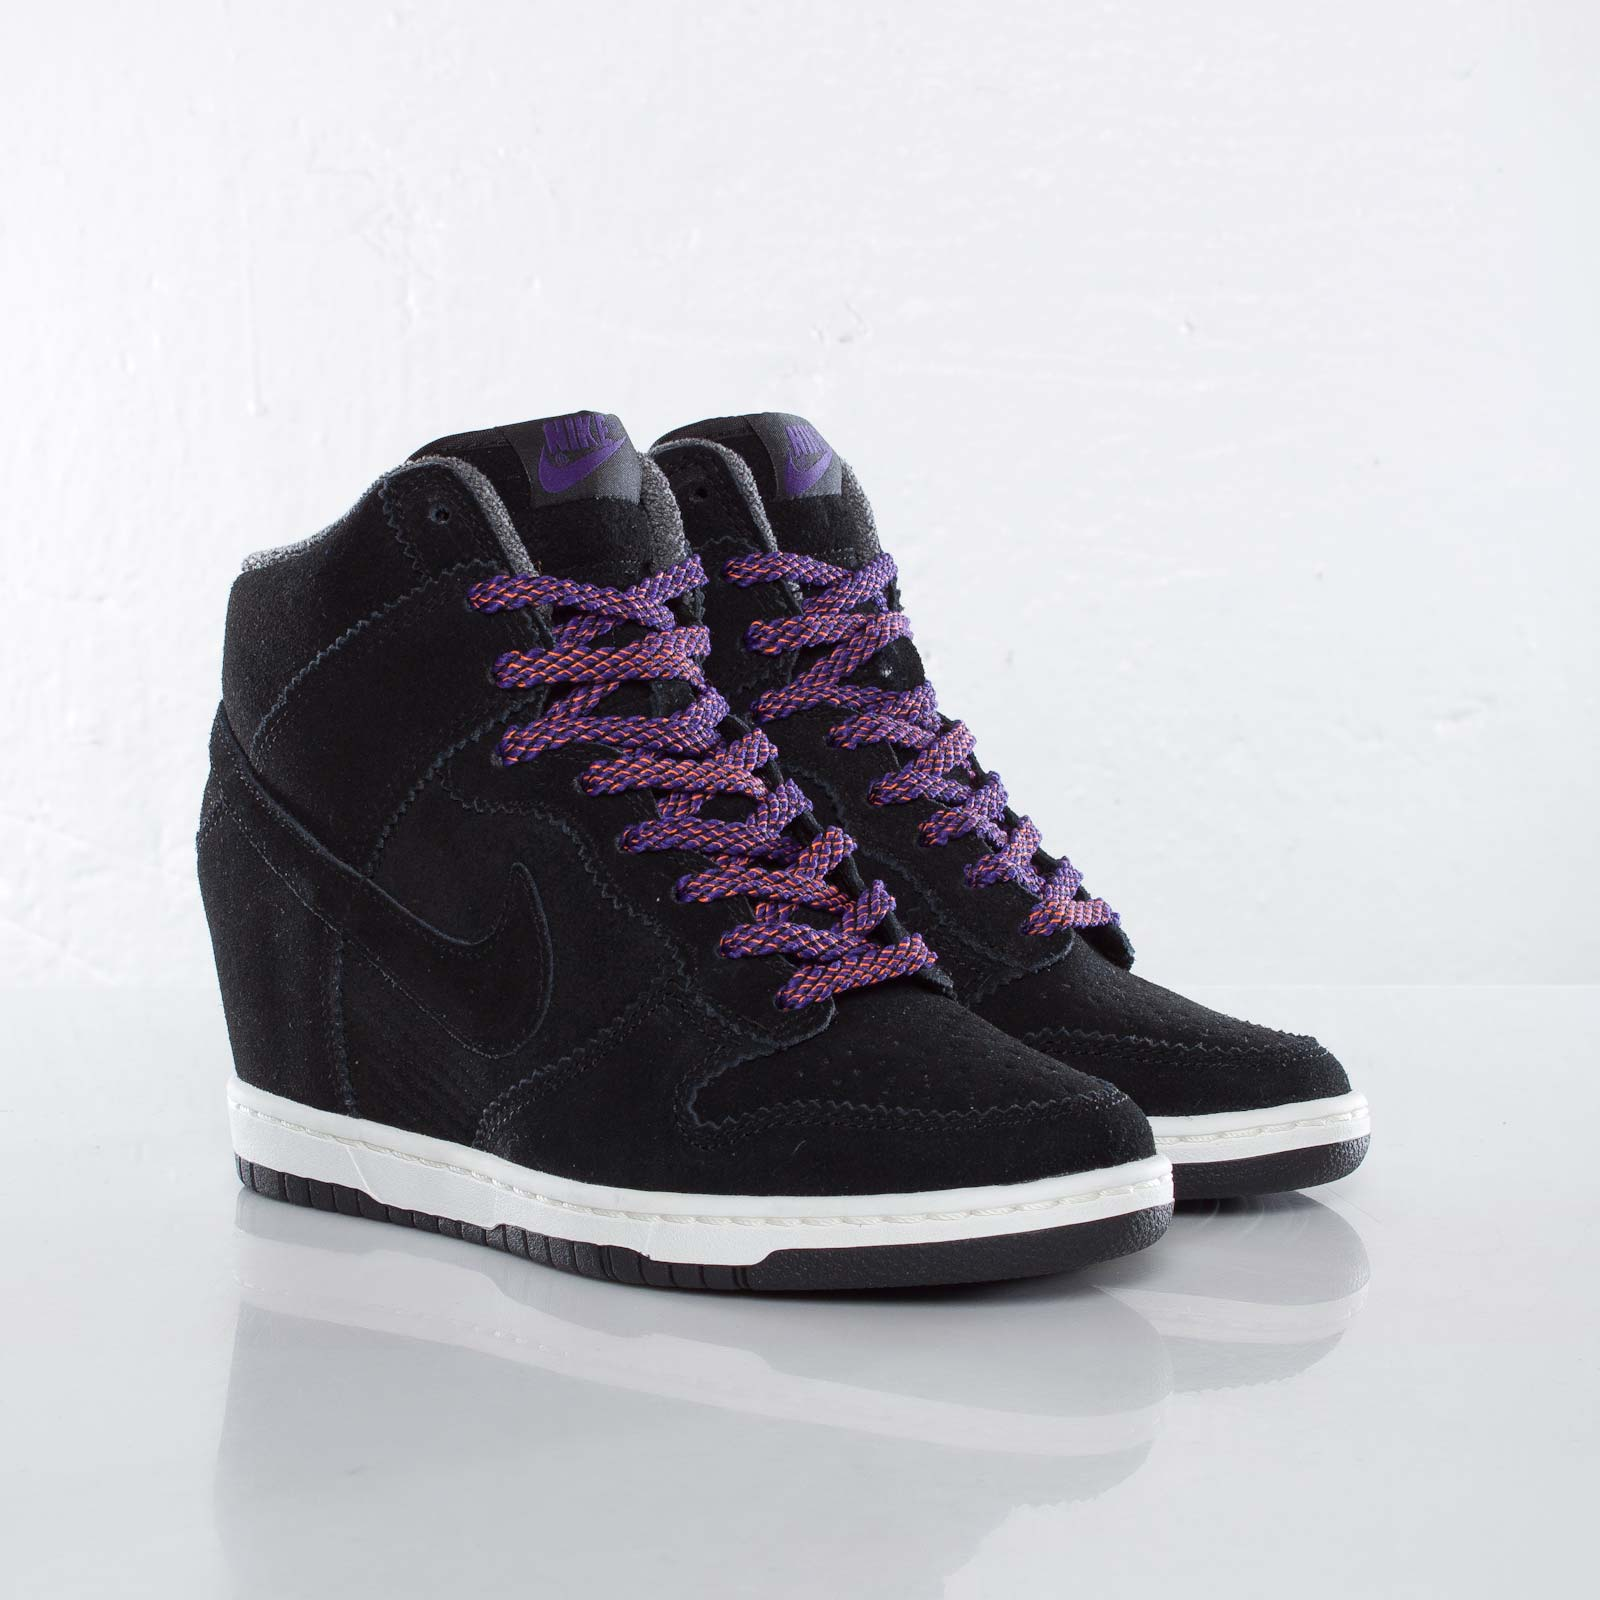 3ae8e0fce6d1 Nike Wmns Dunk Sky Hi - 528899-014 - Sneakersnstuff